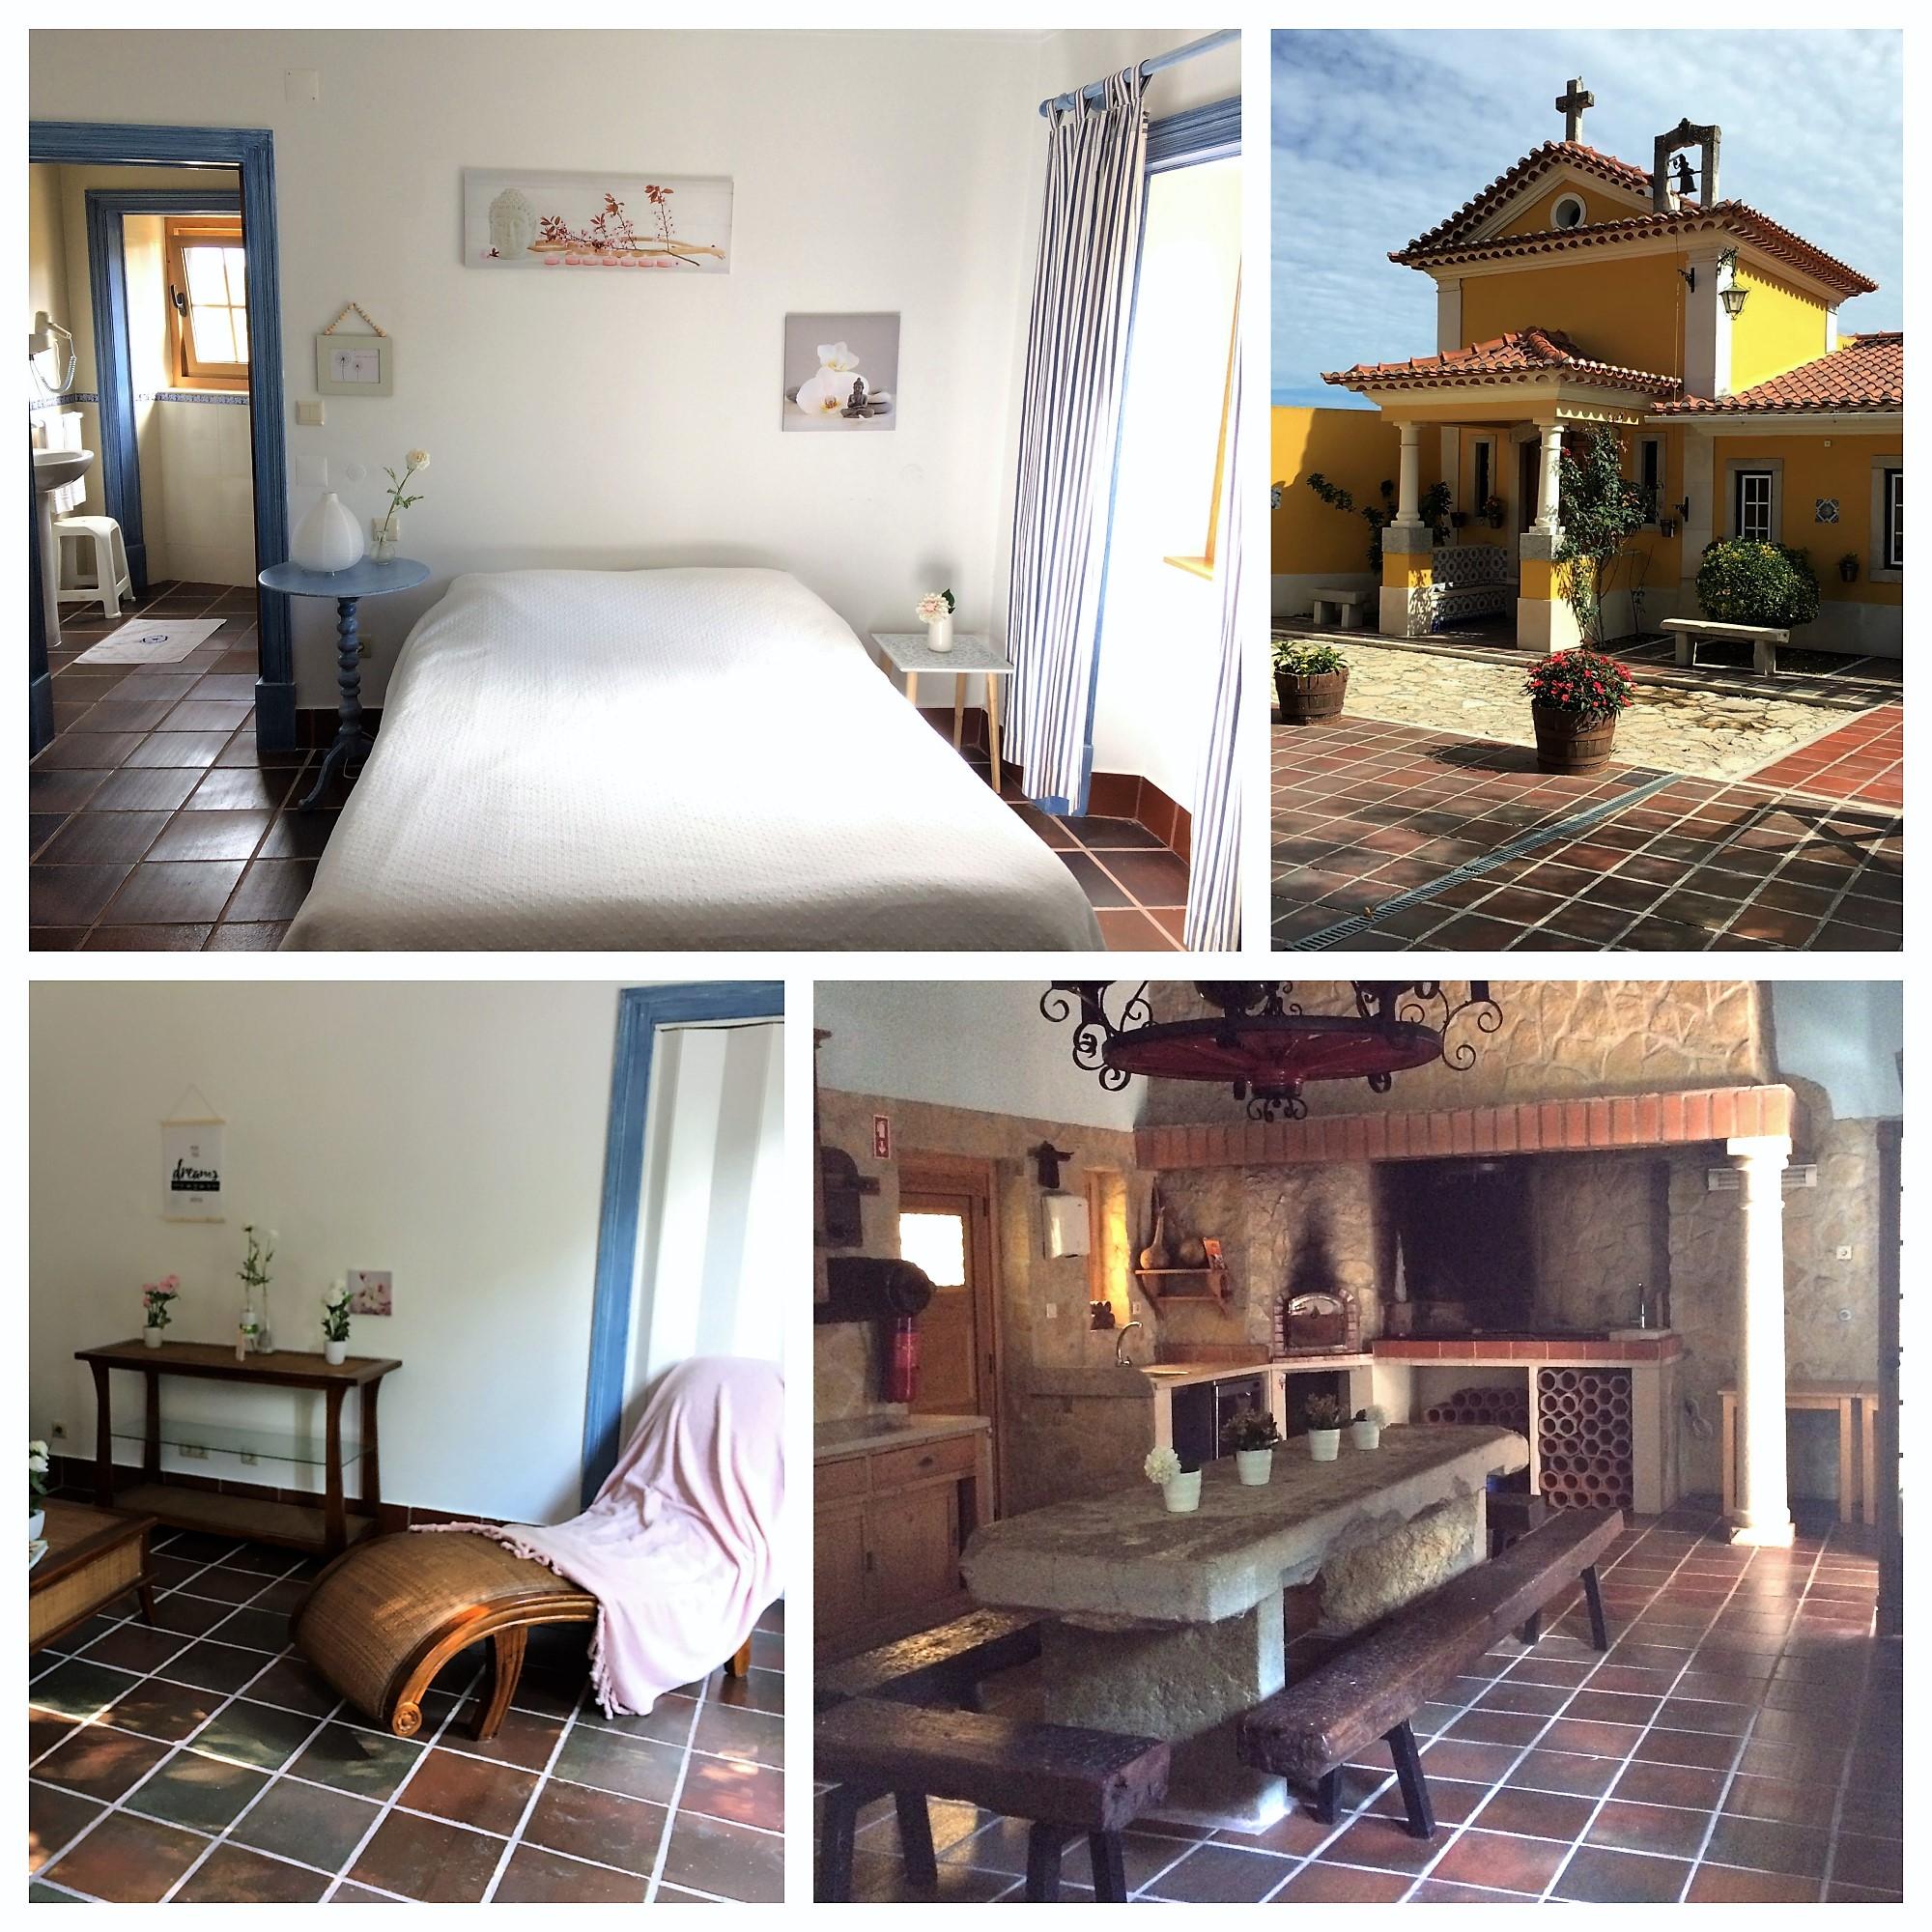 Oergevoel-Olho-Morino-Mansion-Rooms